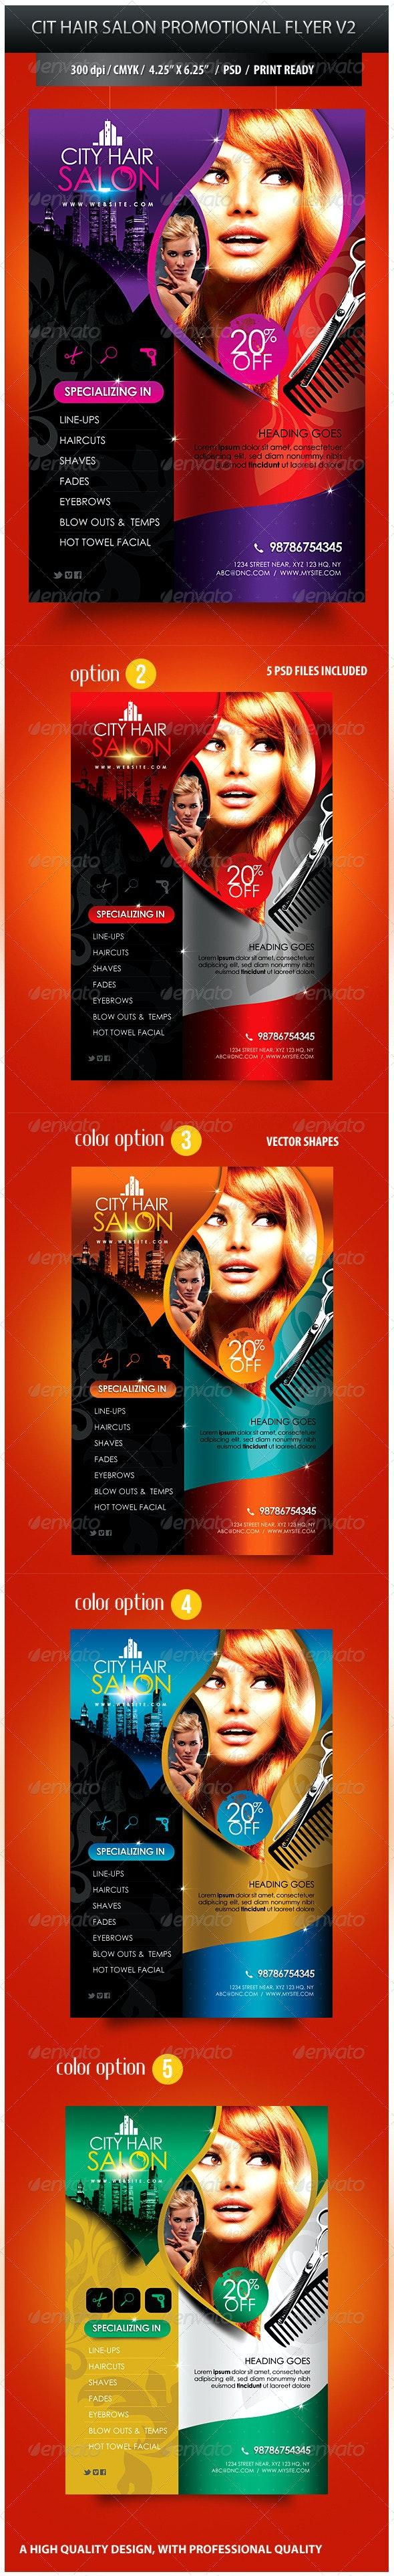 City Hair Salon Promotional Flyer V2 - Commerce Flyers